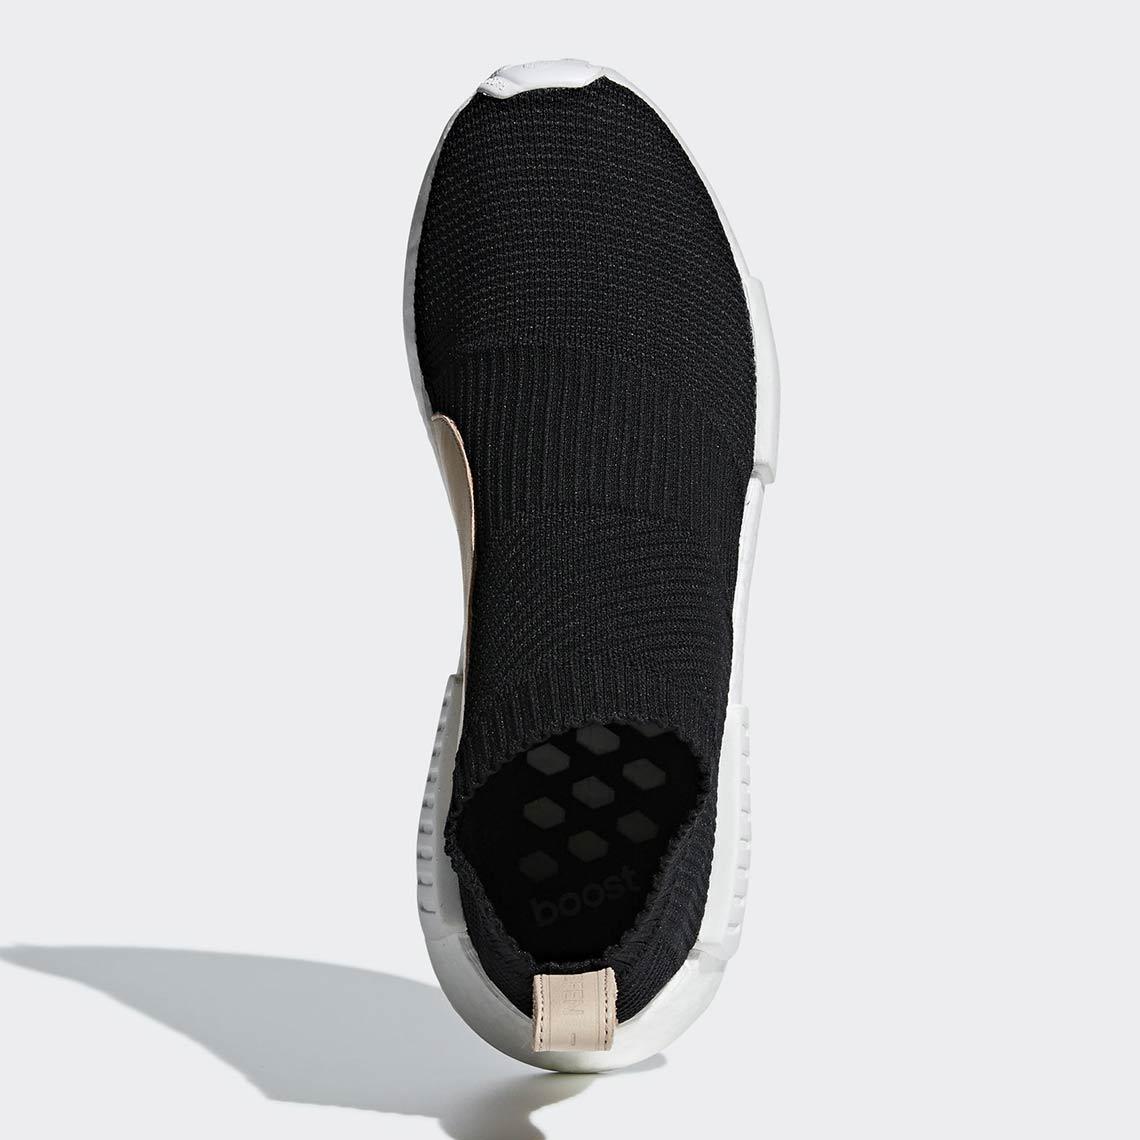 sale retailer 66138 3dd4c adidas NMD City Sock Black/Tan Leather AQ0948 Release Date ...